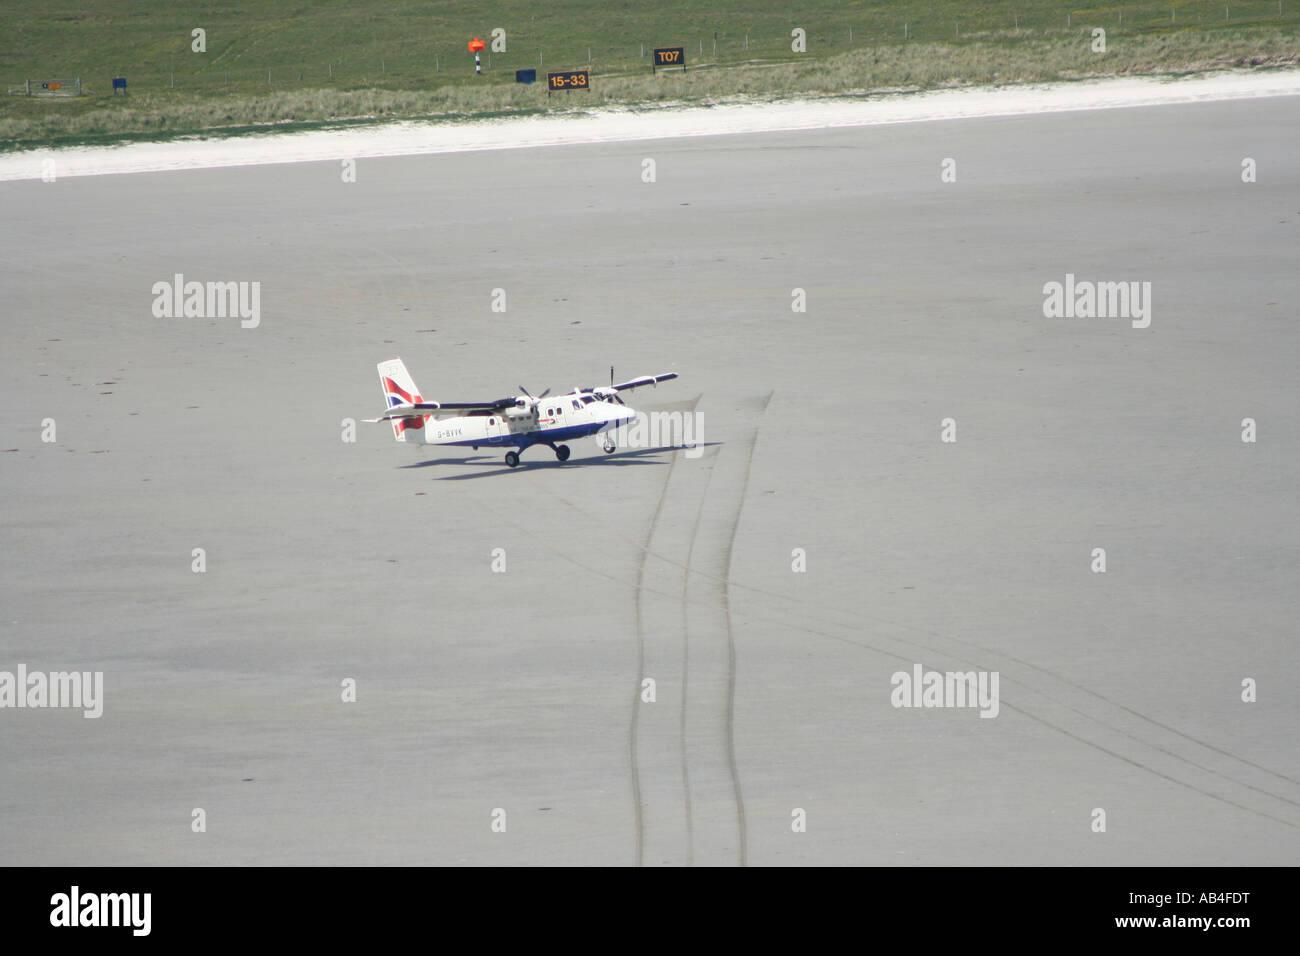 propeller plane landing on beach runway Barra airport Isle of Barra Outer Hebrides Scotland  June 2007 - Stock Image